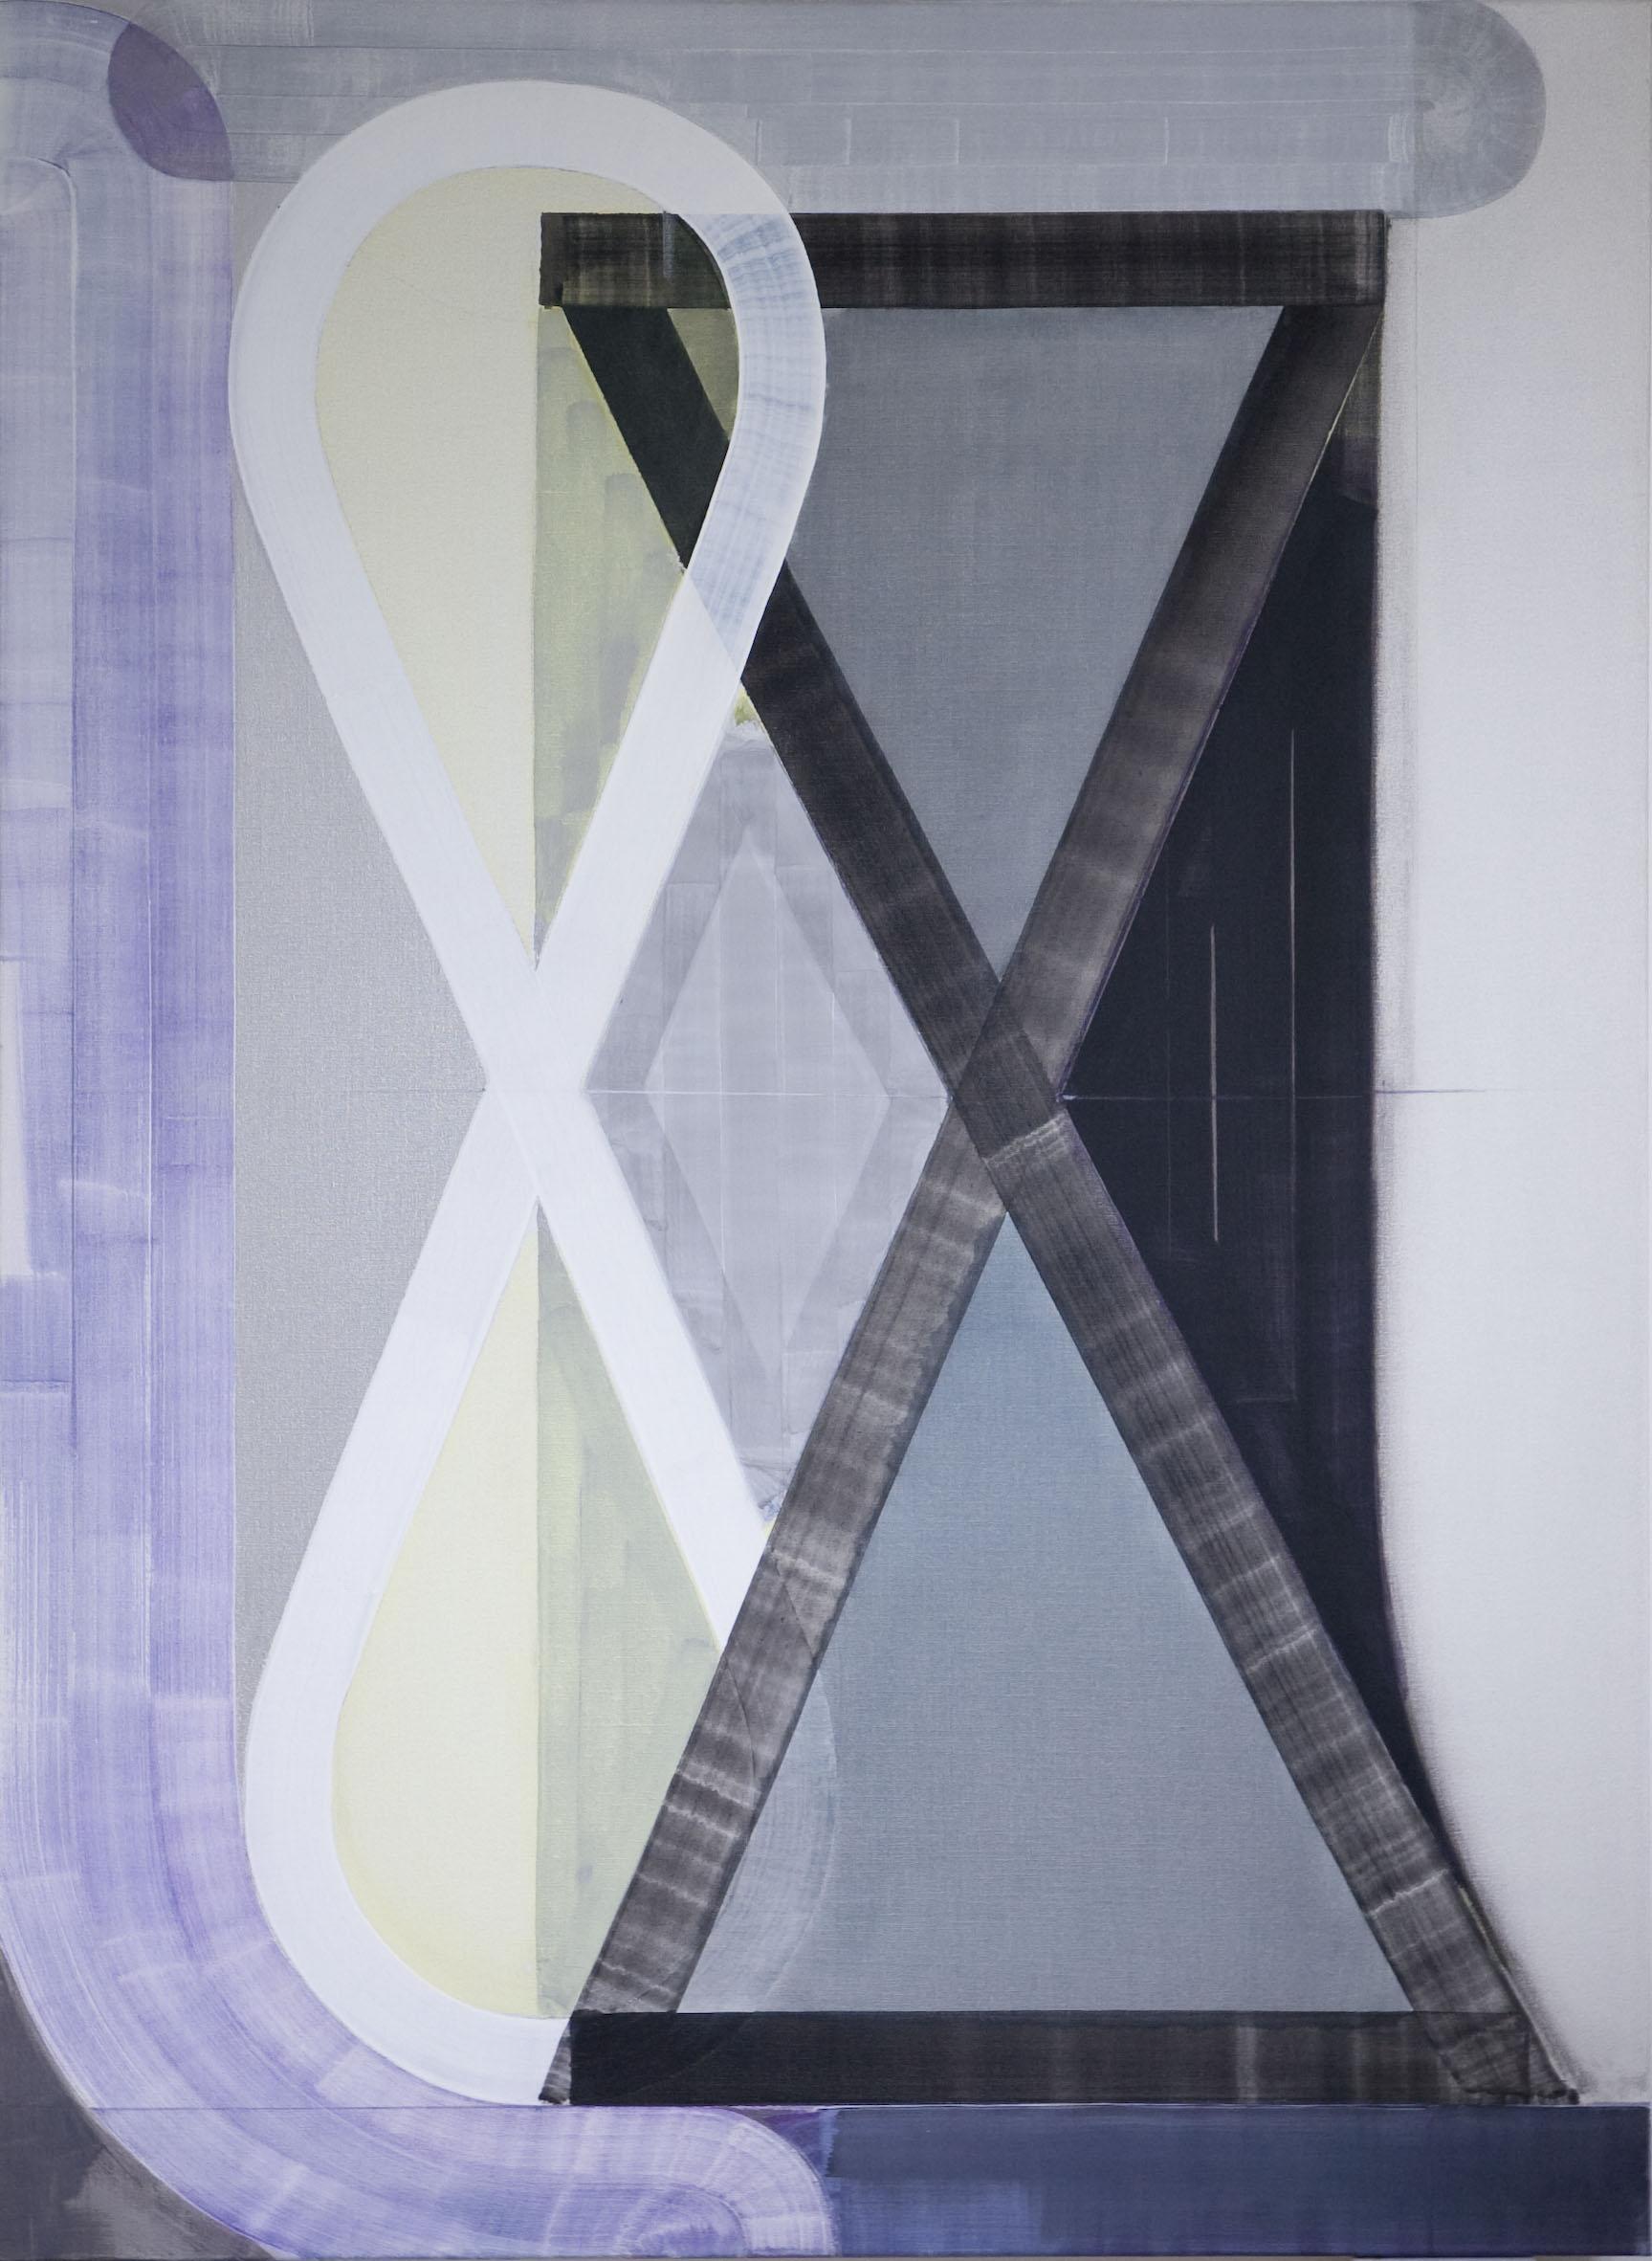 Johan Zevenbergen, Gestalt, 1998